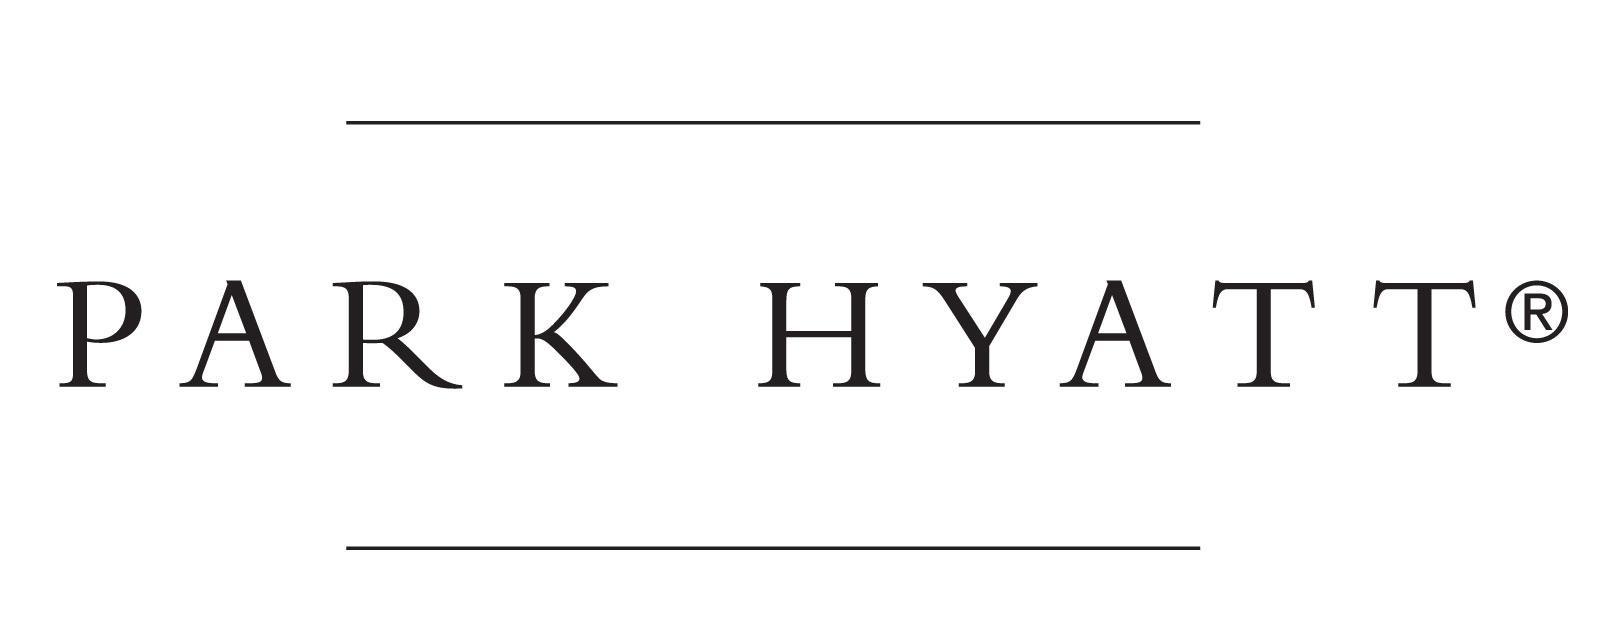 Park Hyatt Zanzibar Officially Opens And Marks First Hyatt